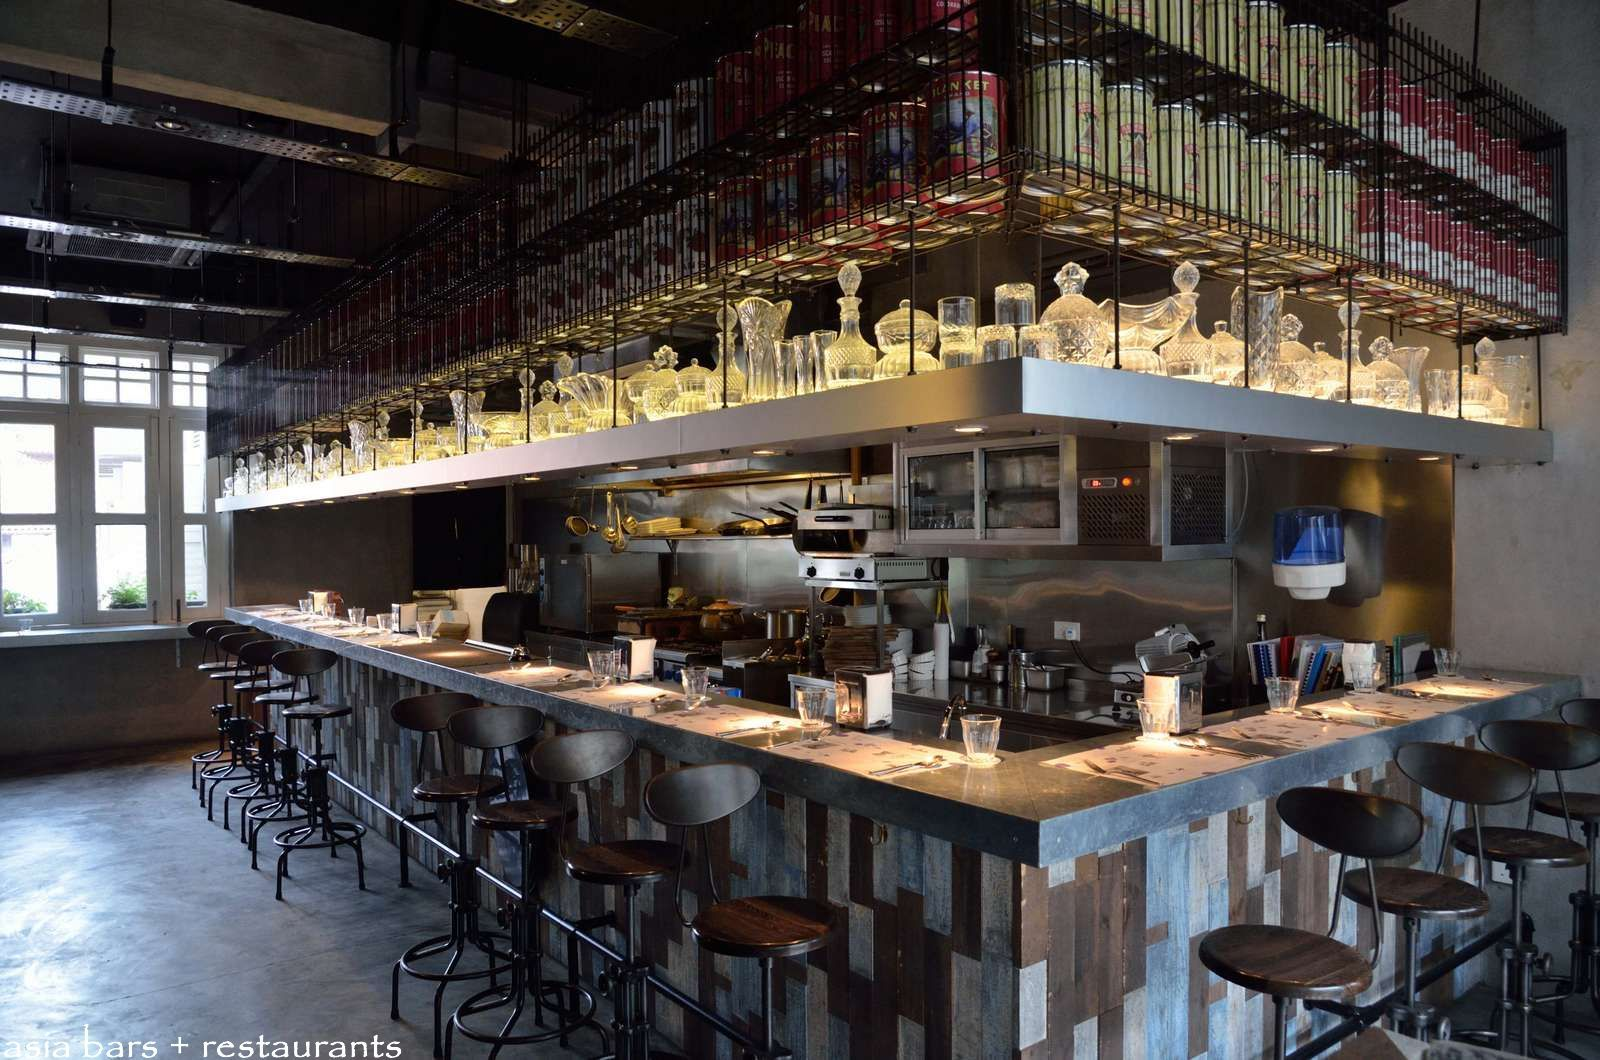 Restaurant kitchen design  Lolla Singapore  small plates to share  Restaurants around the